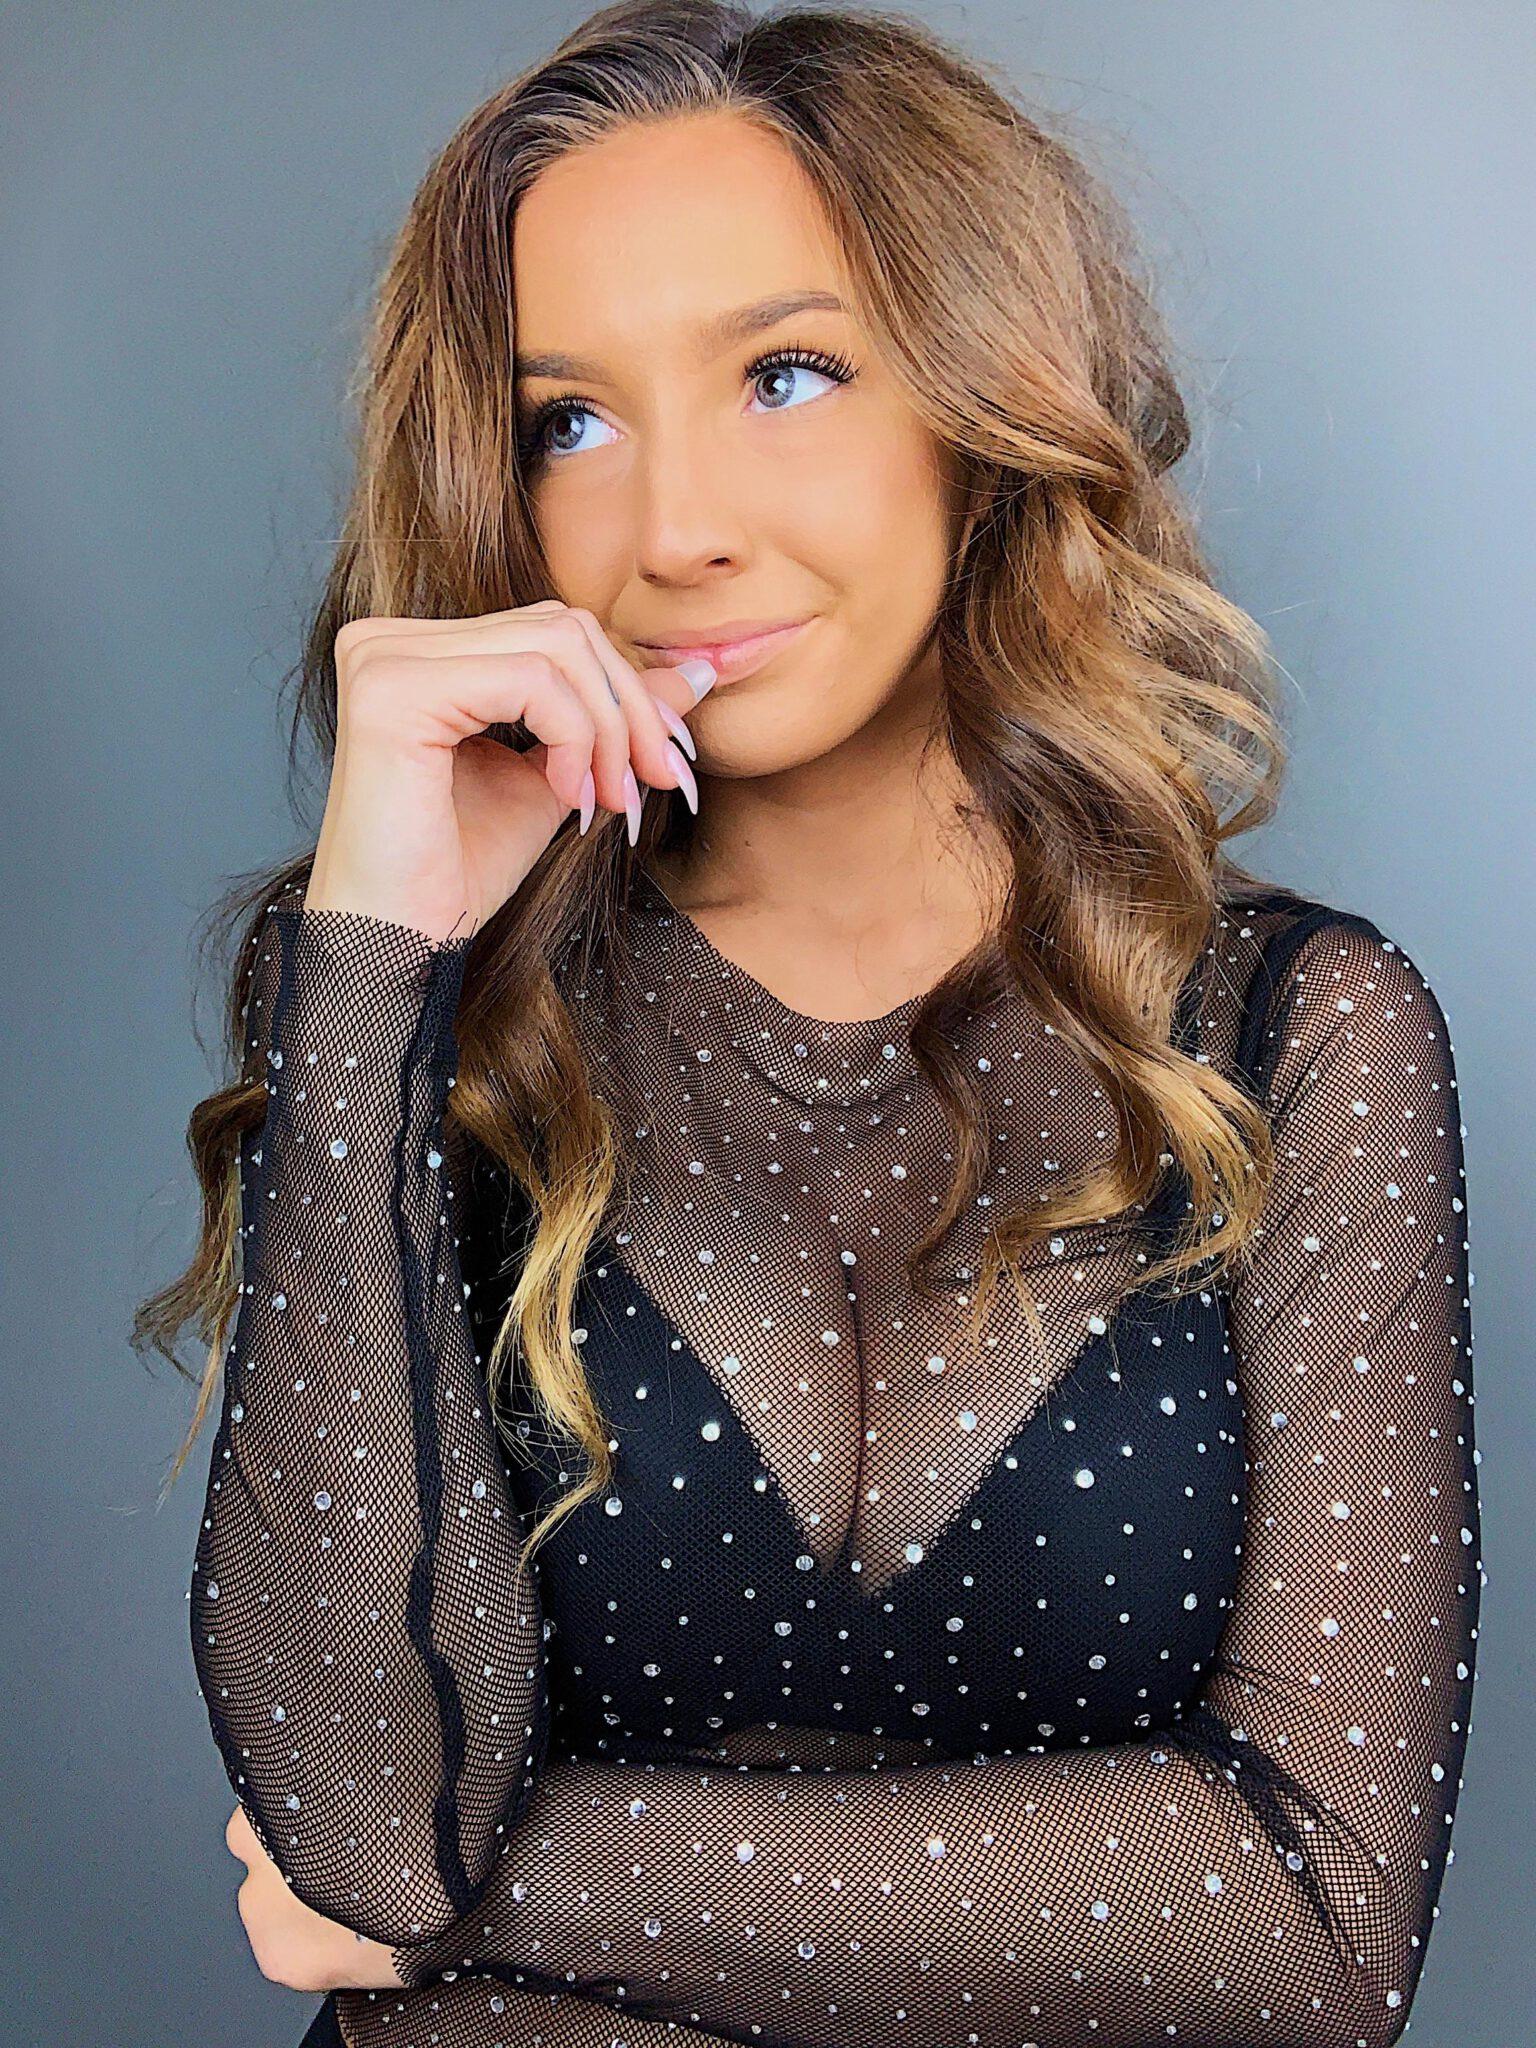 Taylor Alesia 11th Leaked Patreon Set - Social Media Girls